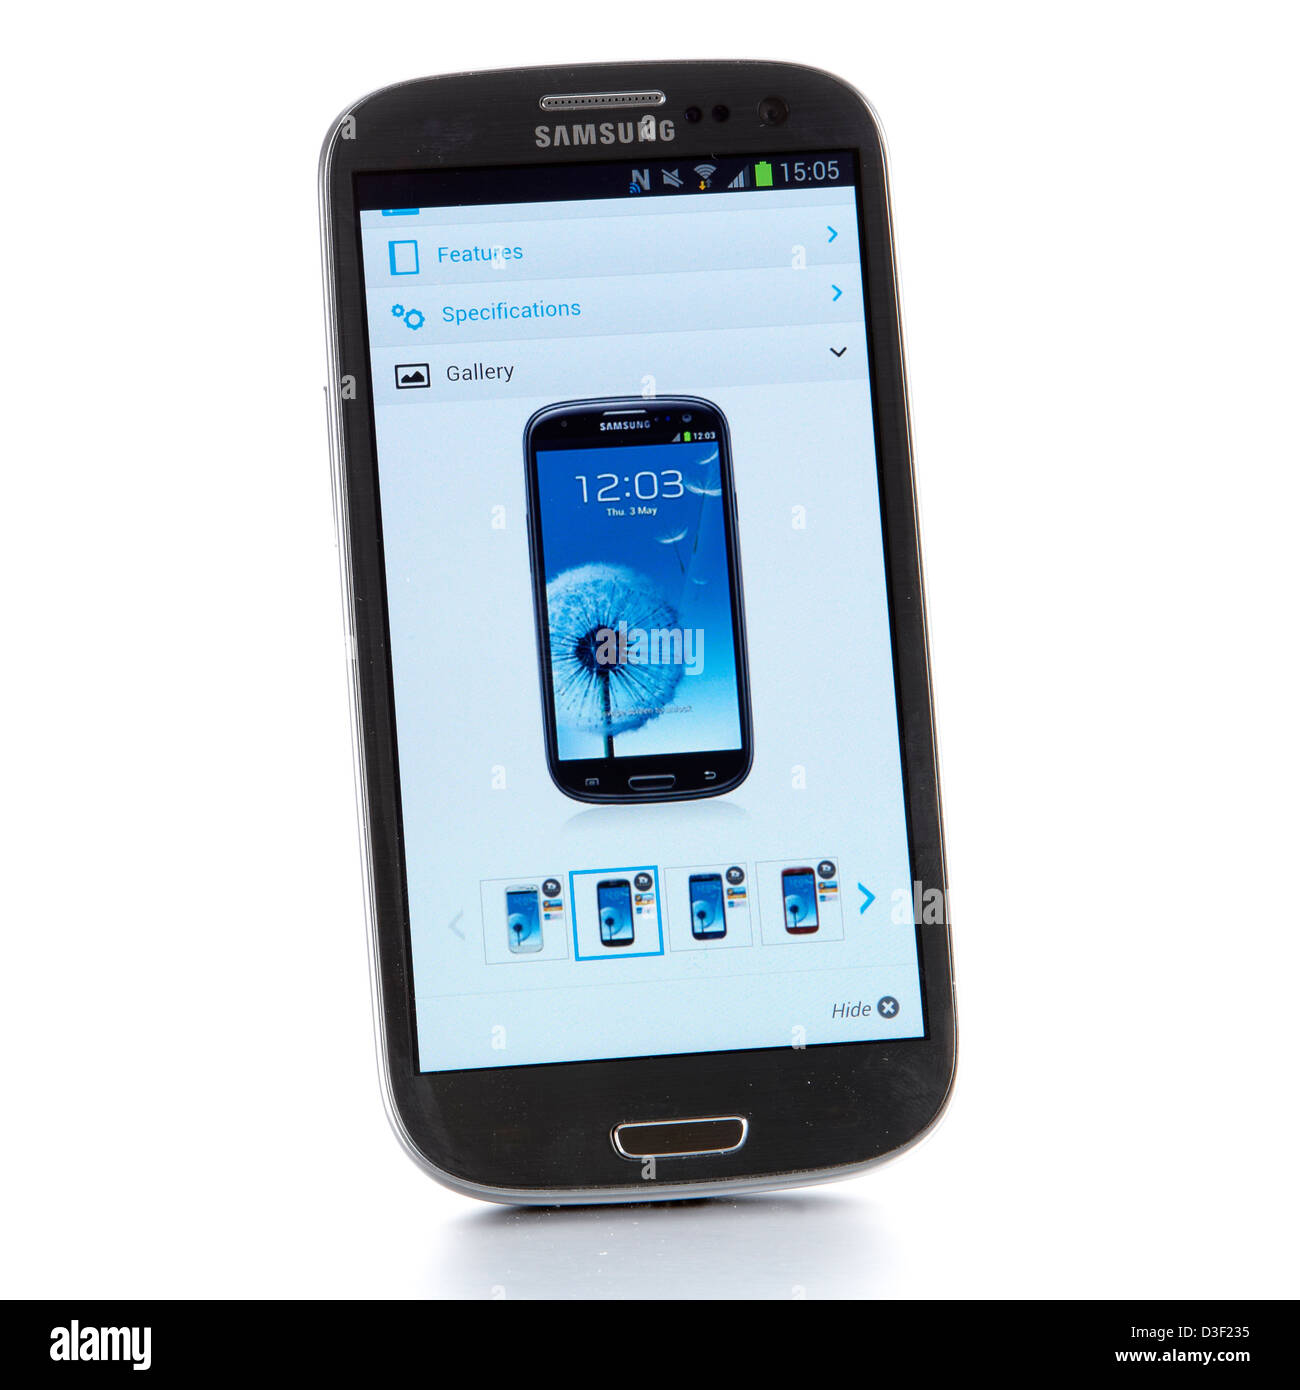 Samsung Galaxy smart phone Google - Stock Image